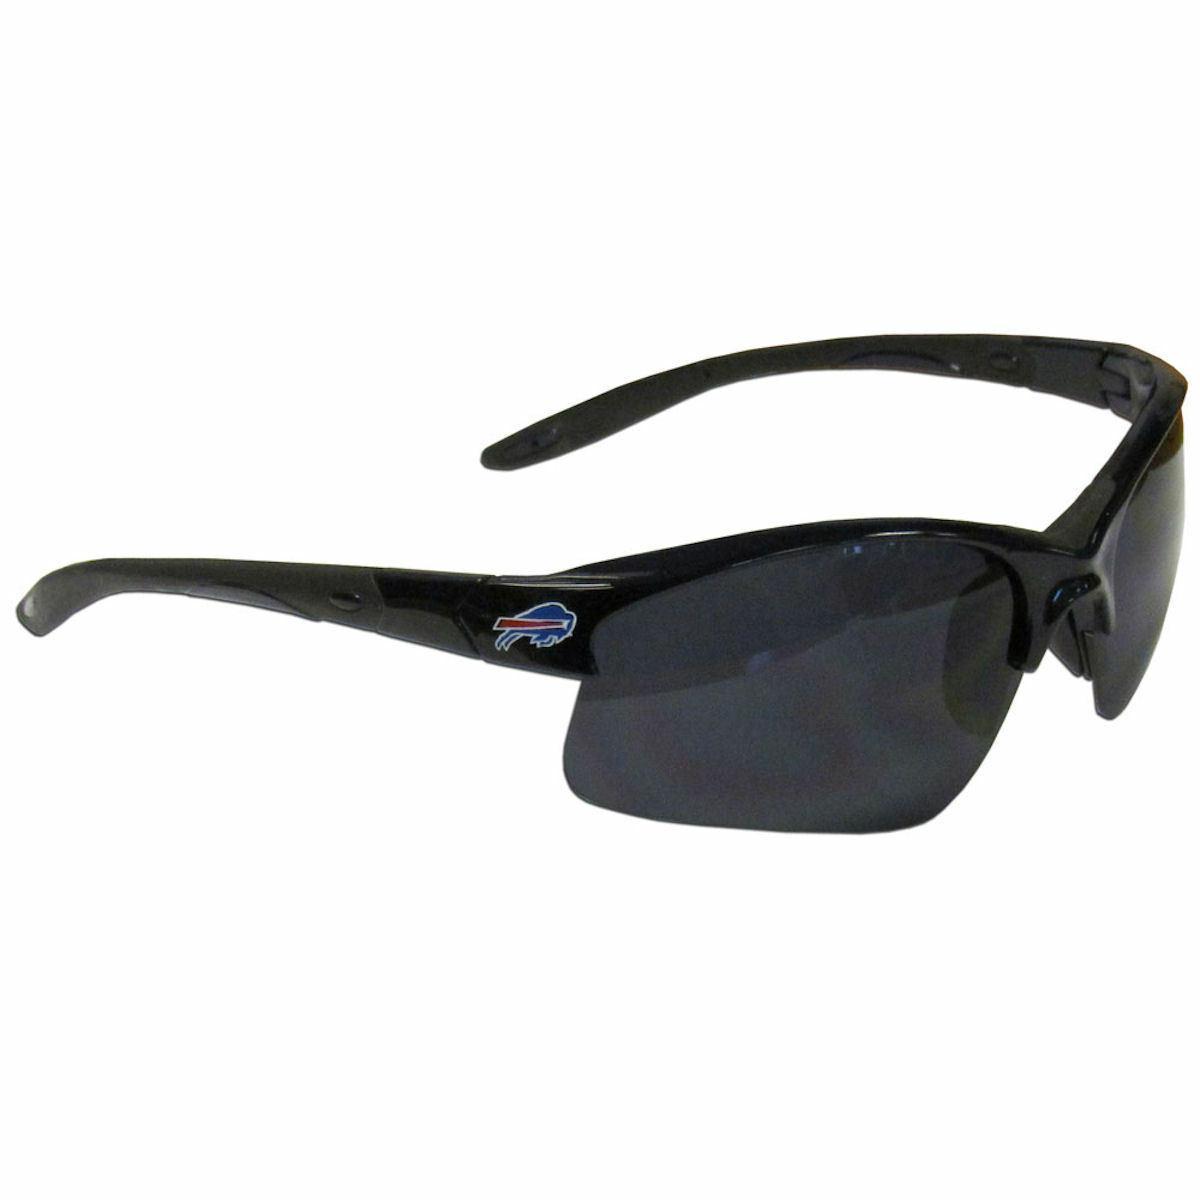 blade sunglasses NFL PICK